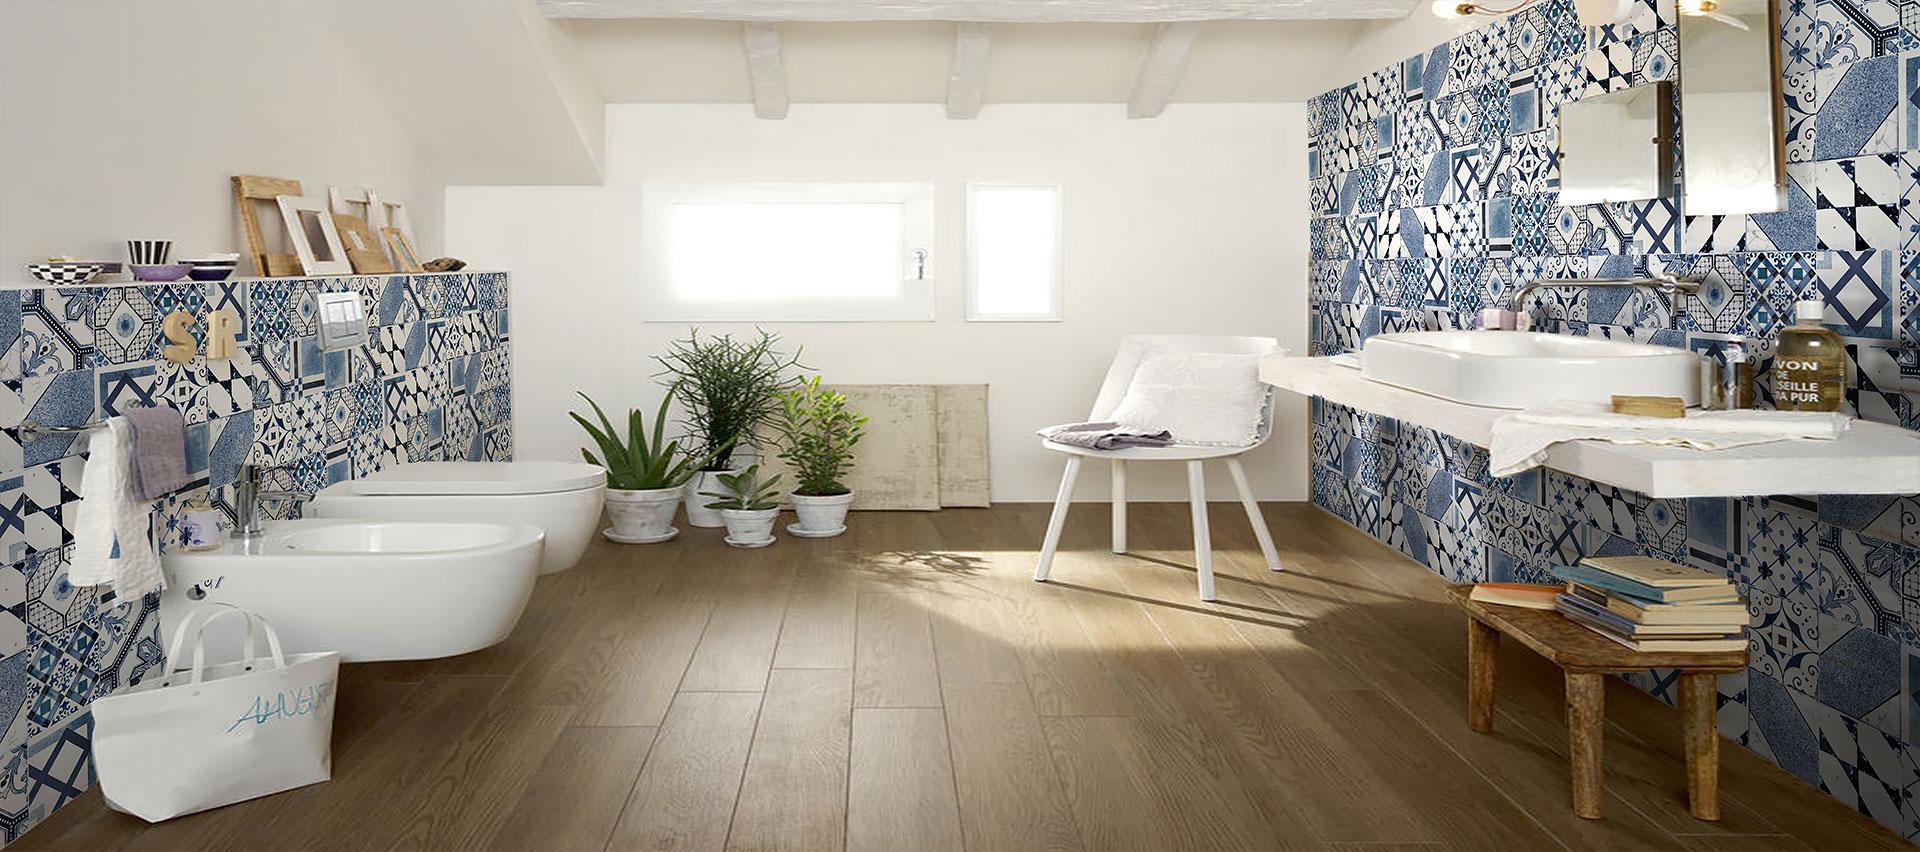 maiolica-mix-blue-mediterranean-tile-floor-bathroom-wall